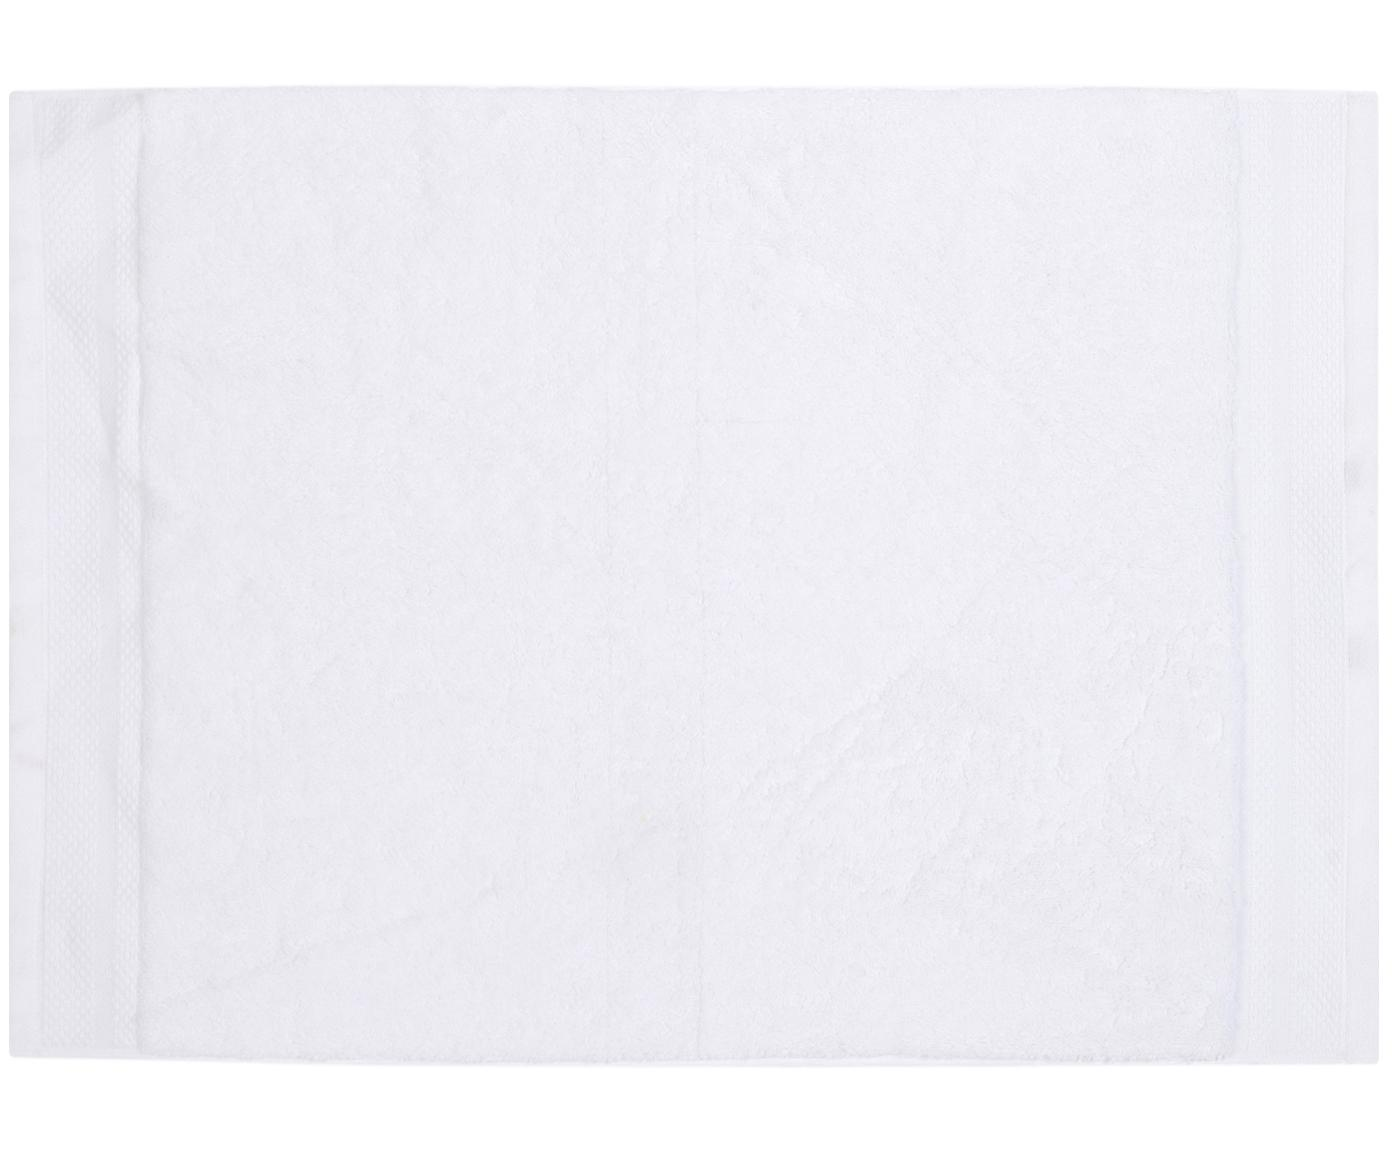 Badmat Premium, 100% katoen, zware kwaliteit, 600 g/m², Wit, 50 x 70 cm